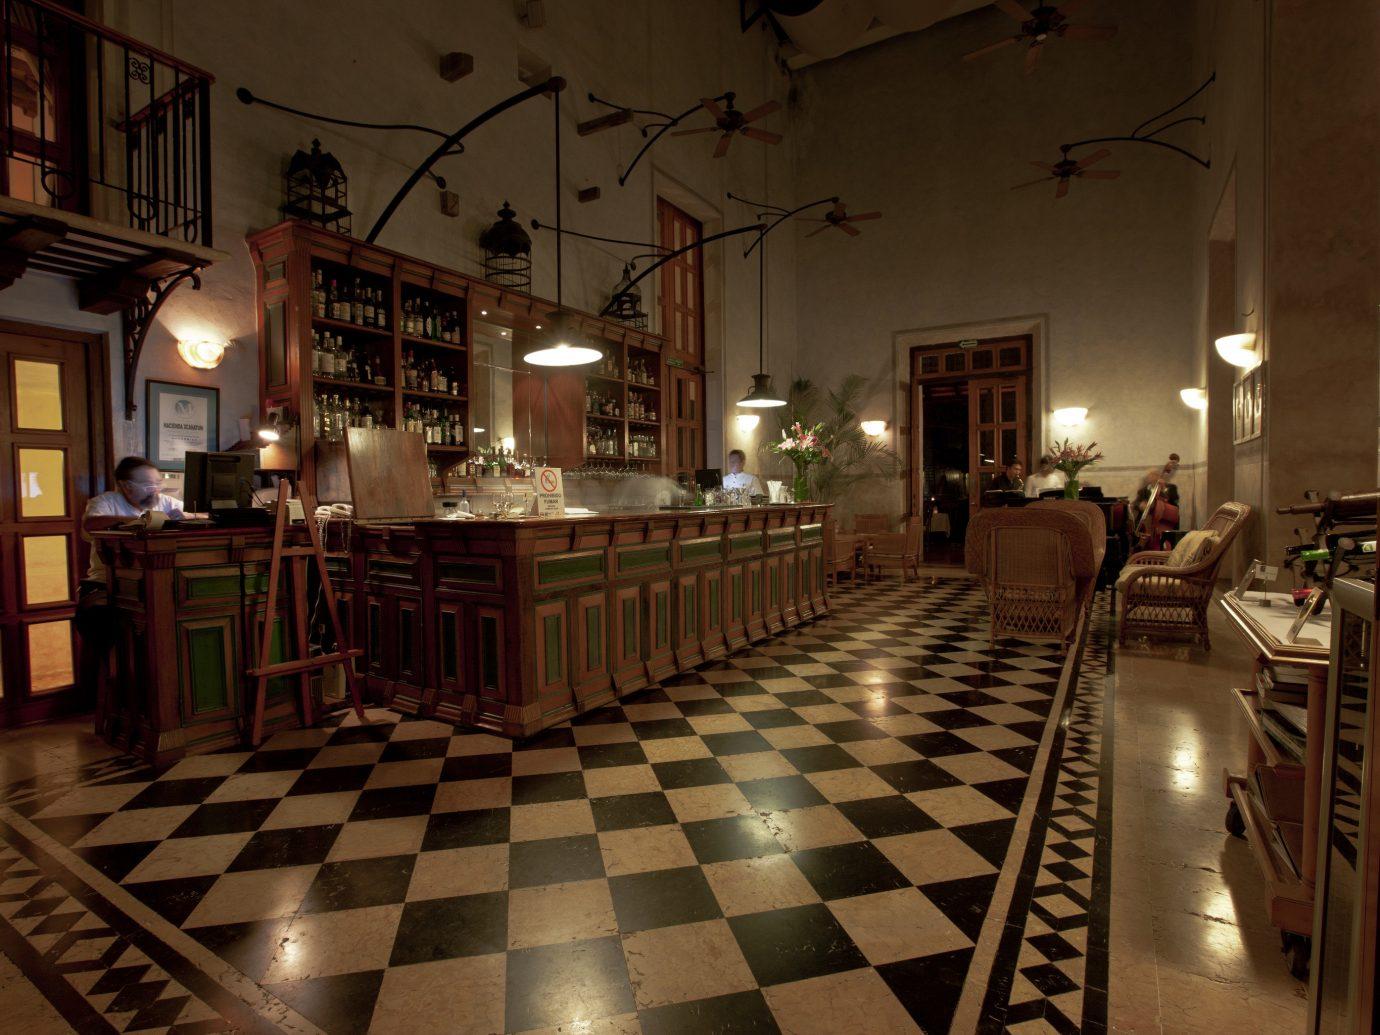 Beach Honeymoon Hotels Mexico Romance Tulum restaurant interior design lighting flooring floor night Lobby